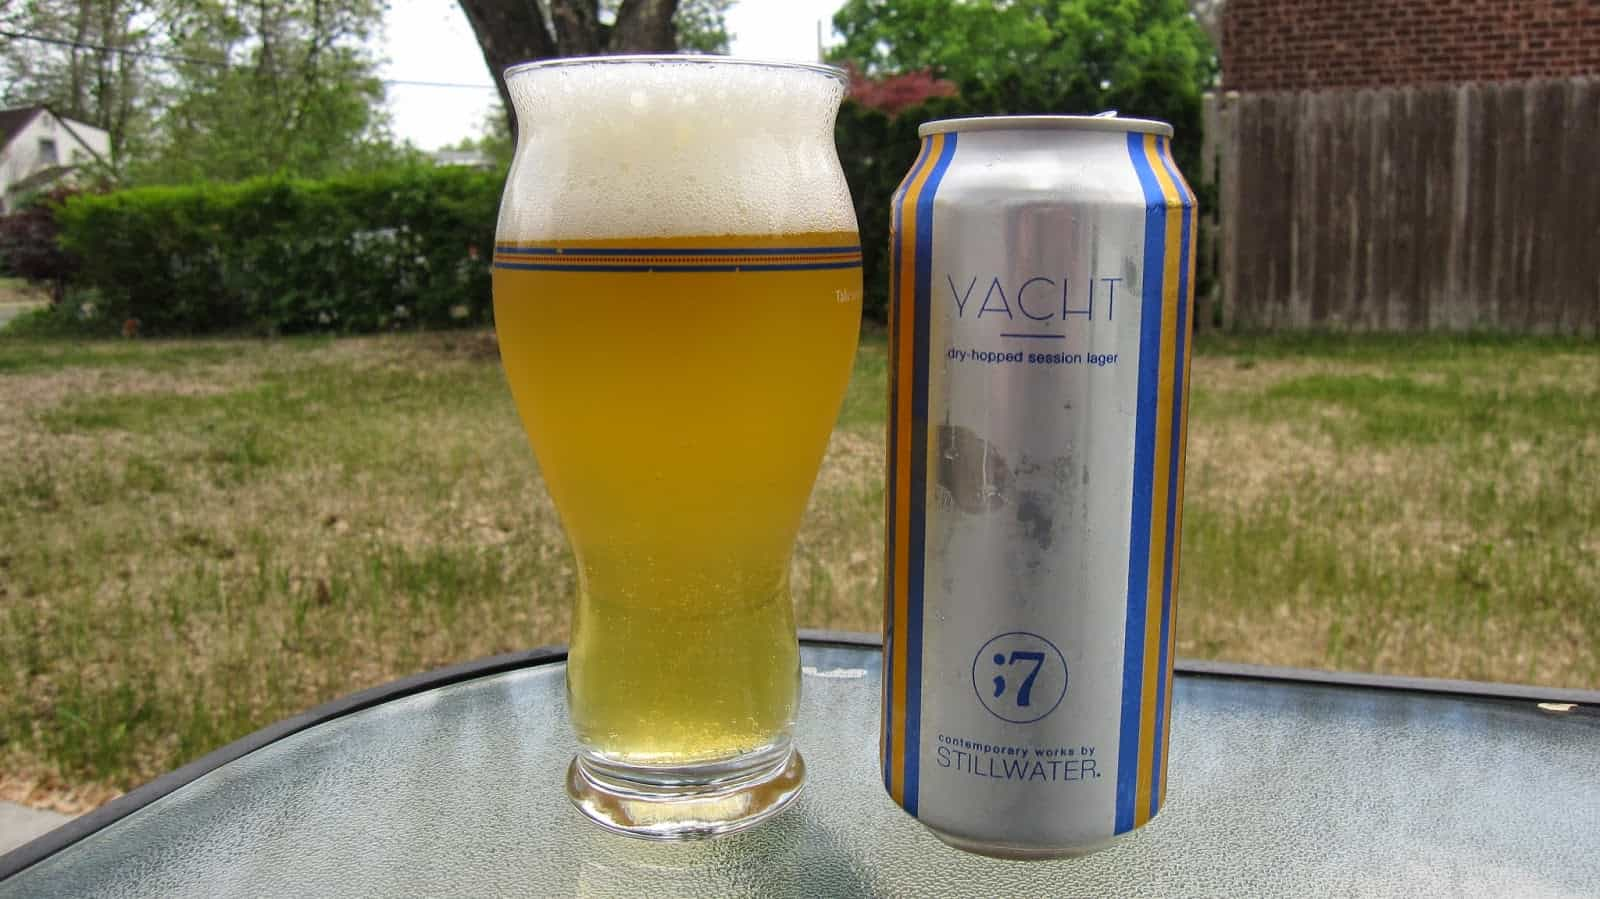 Yacht – light beer